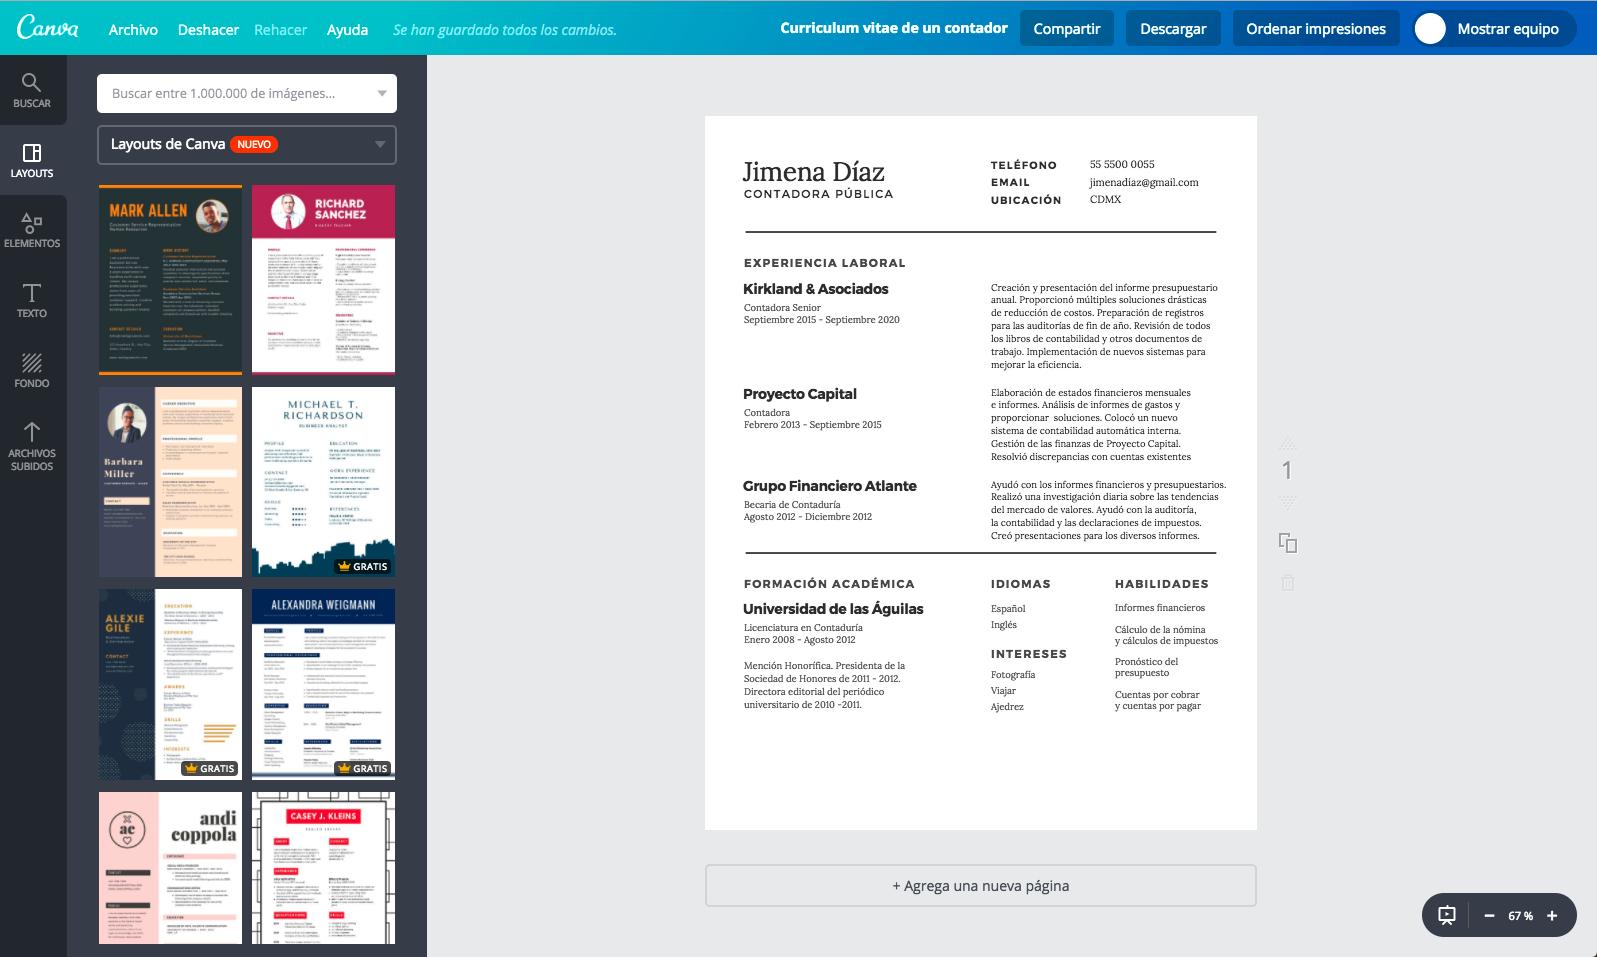 Diseña un currículum vitae de contador online gratis - Canva